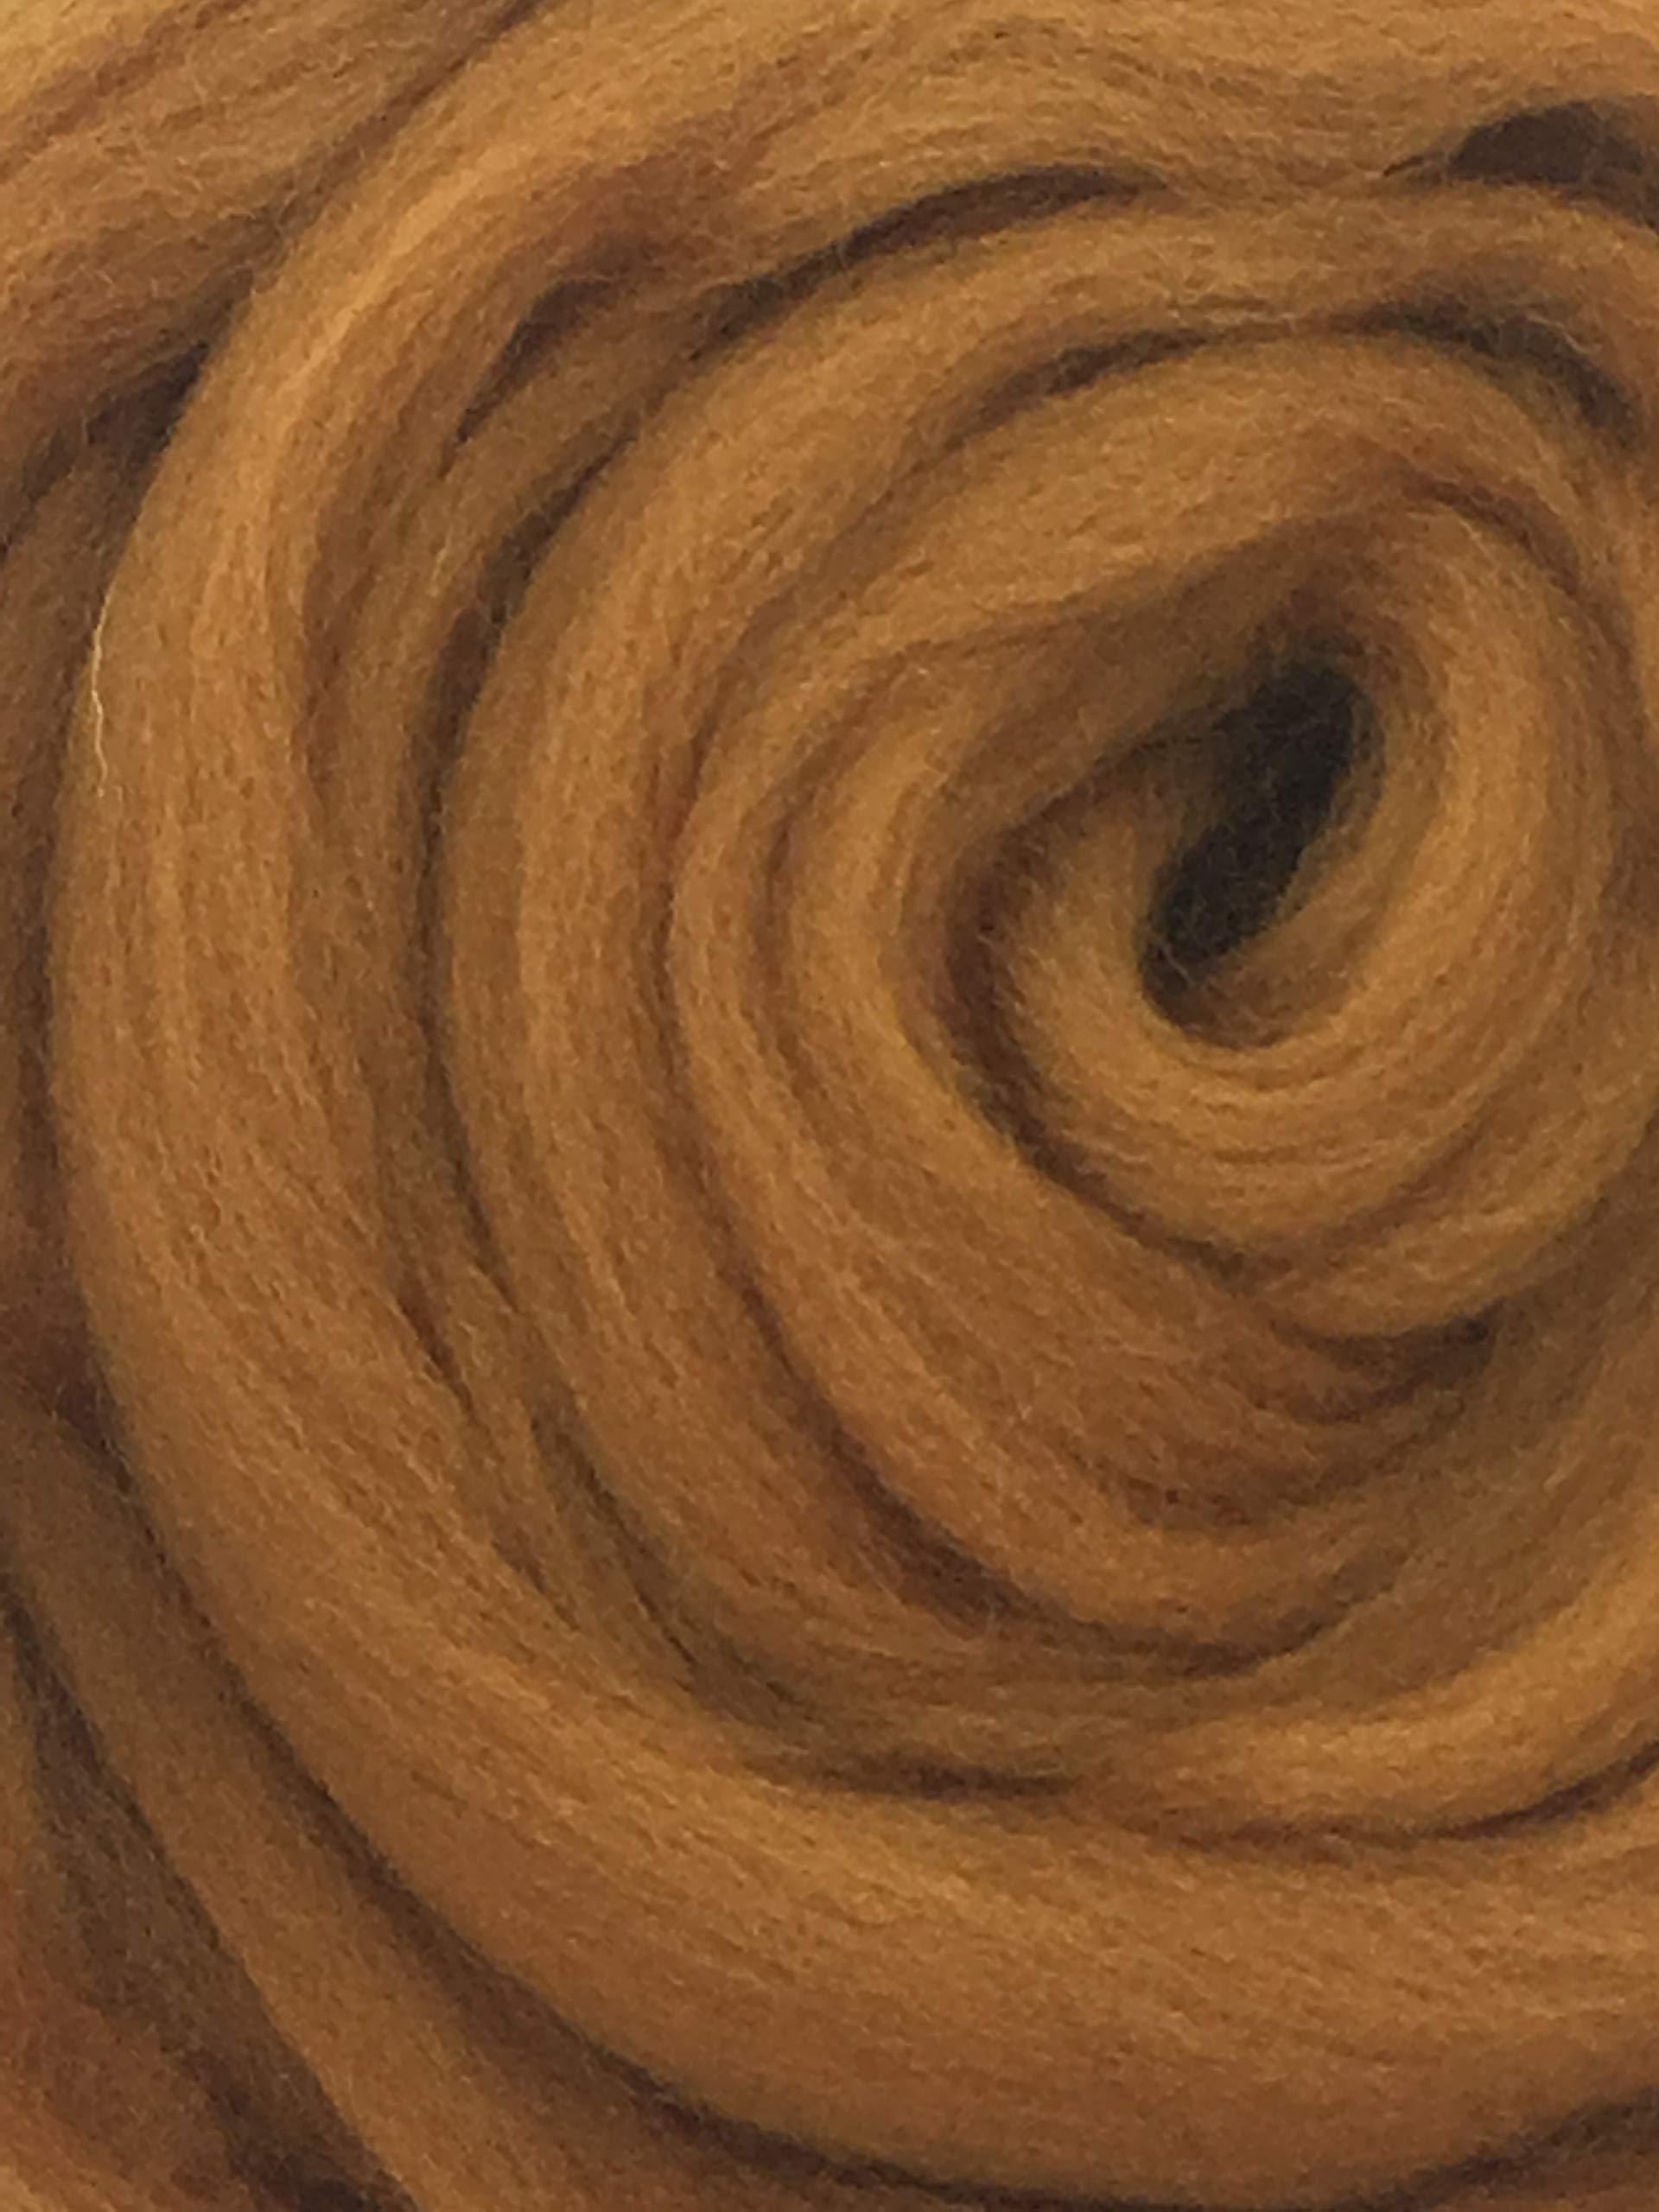 Cinnamon Spice Wool Top Roving Fiber Spinning, Felting Crafts USA (1lb)